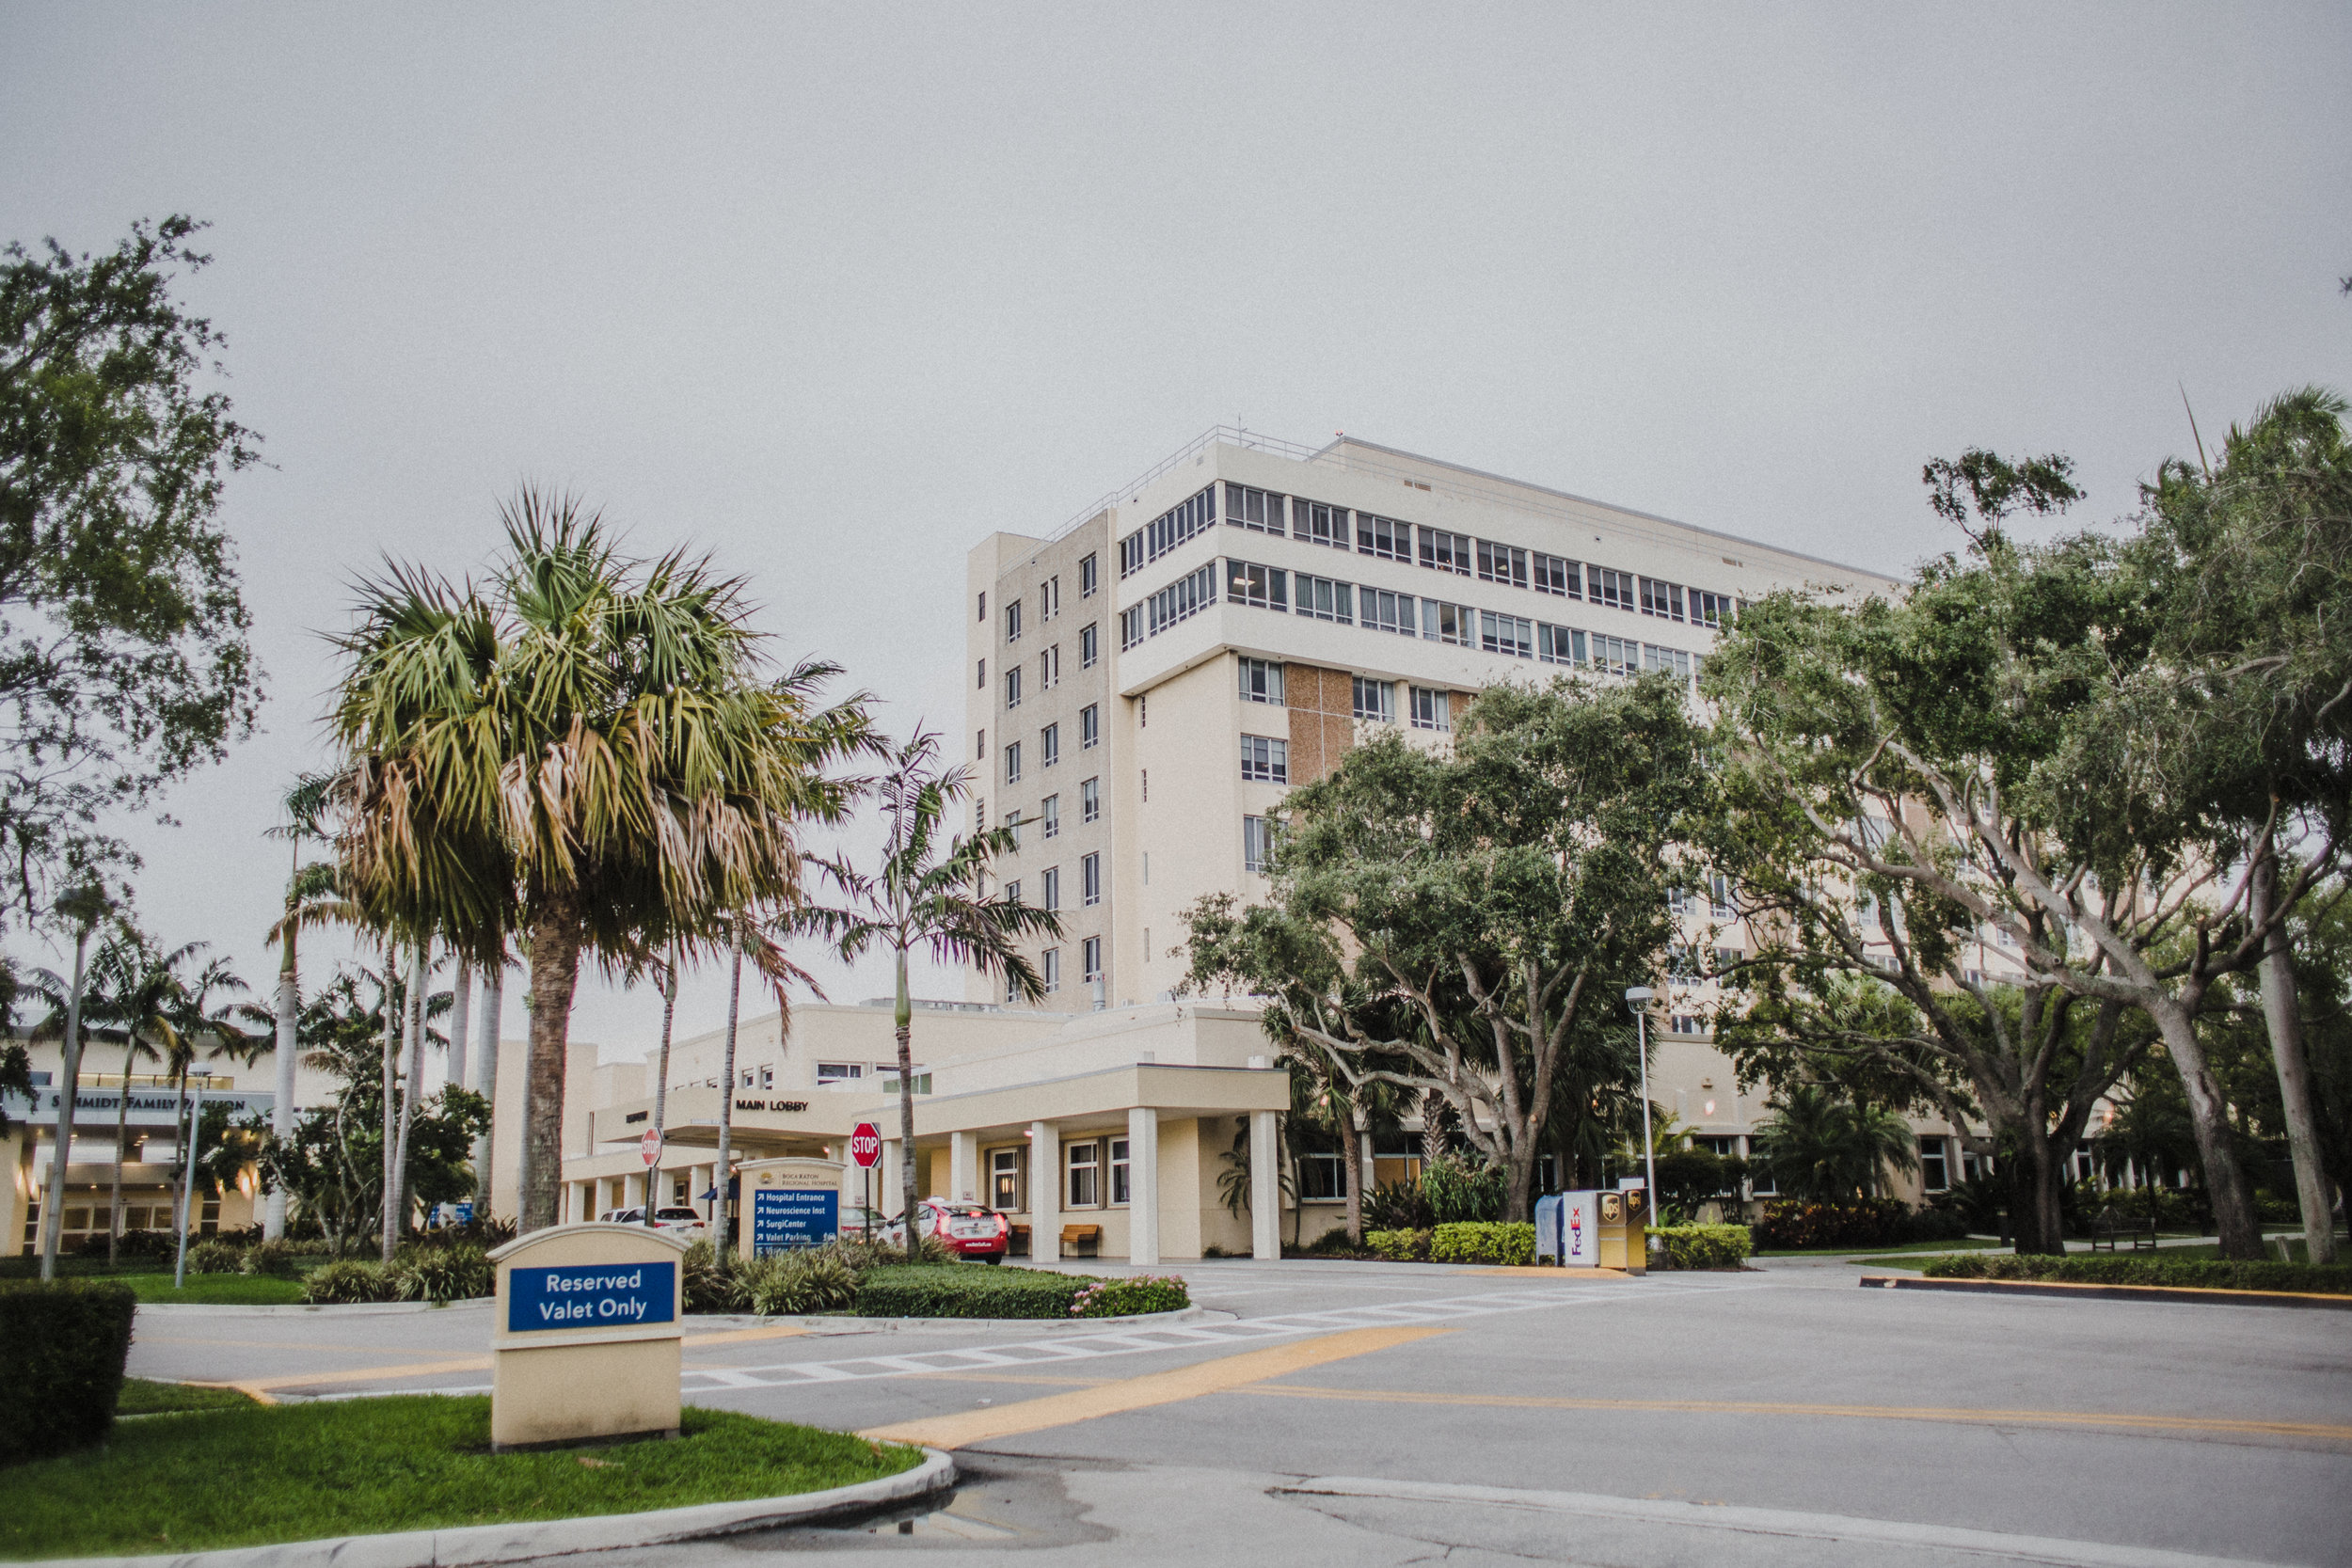 Boca Raton Regional Hospital, Boca Raton, Florida